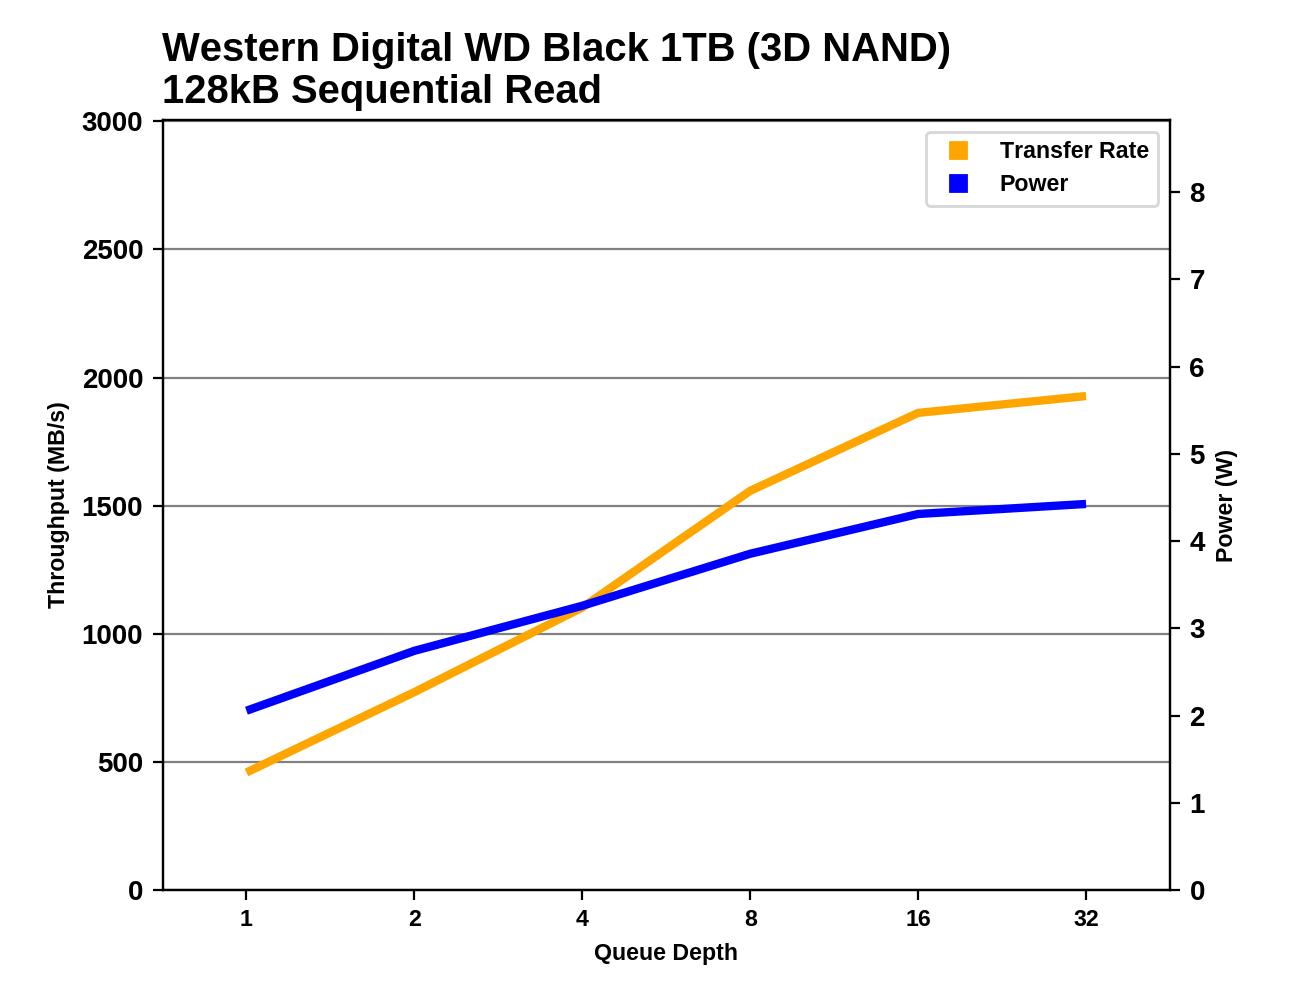 Обзор Western Digital WD Black 3D NAND SSD: EVO встретил равного - 76